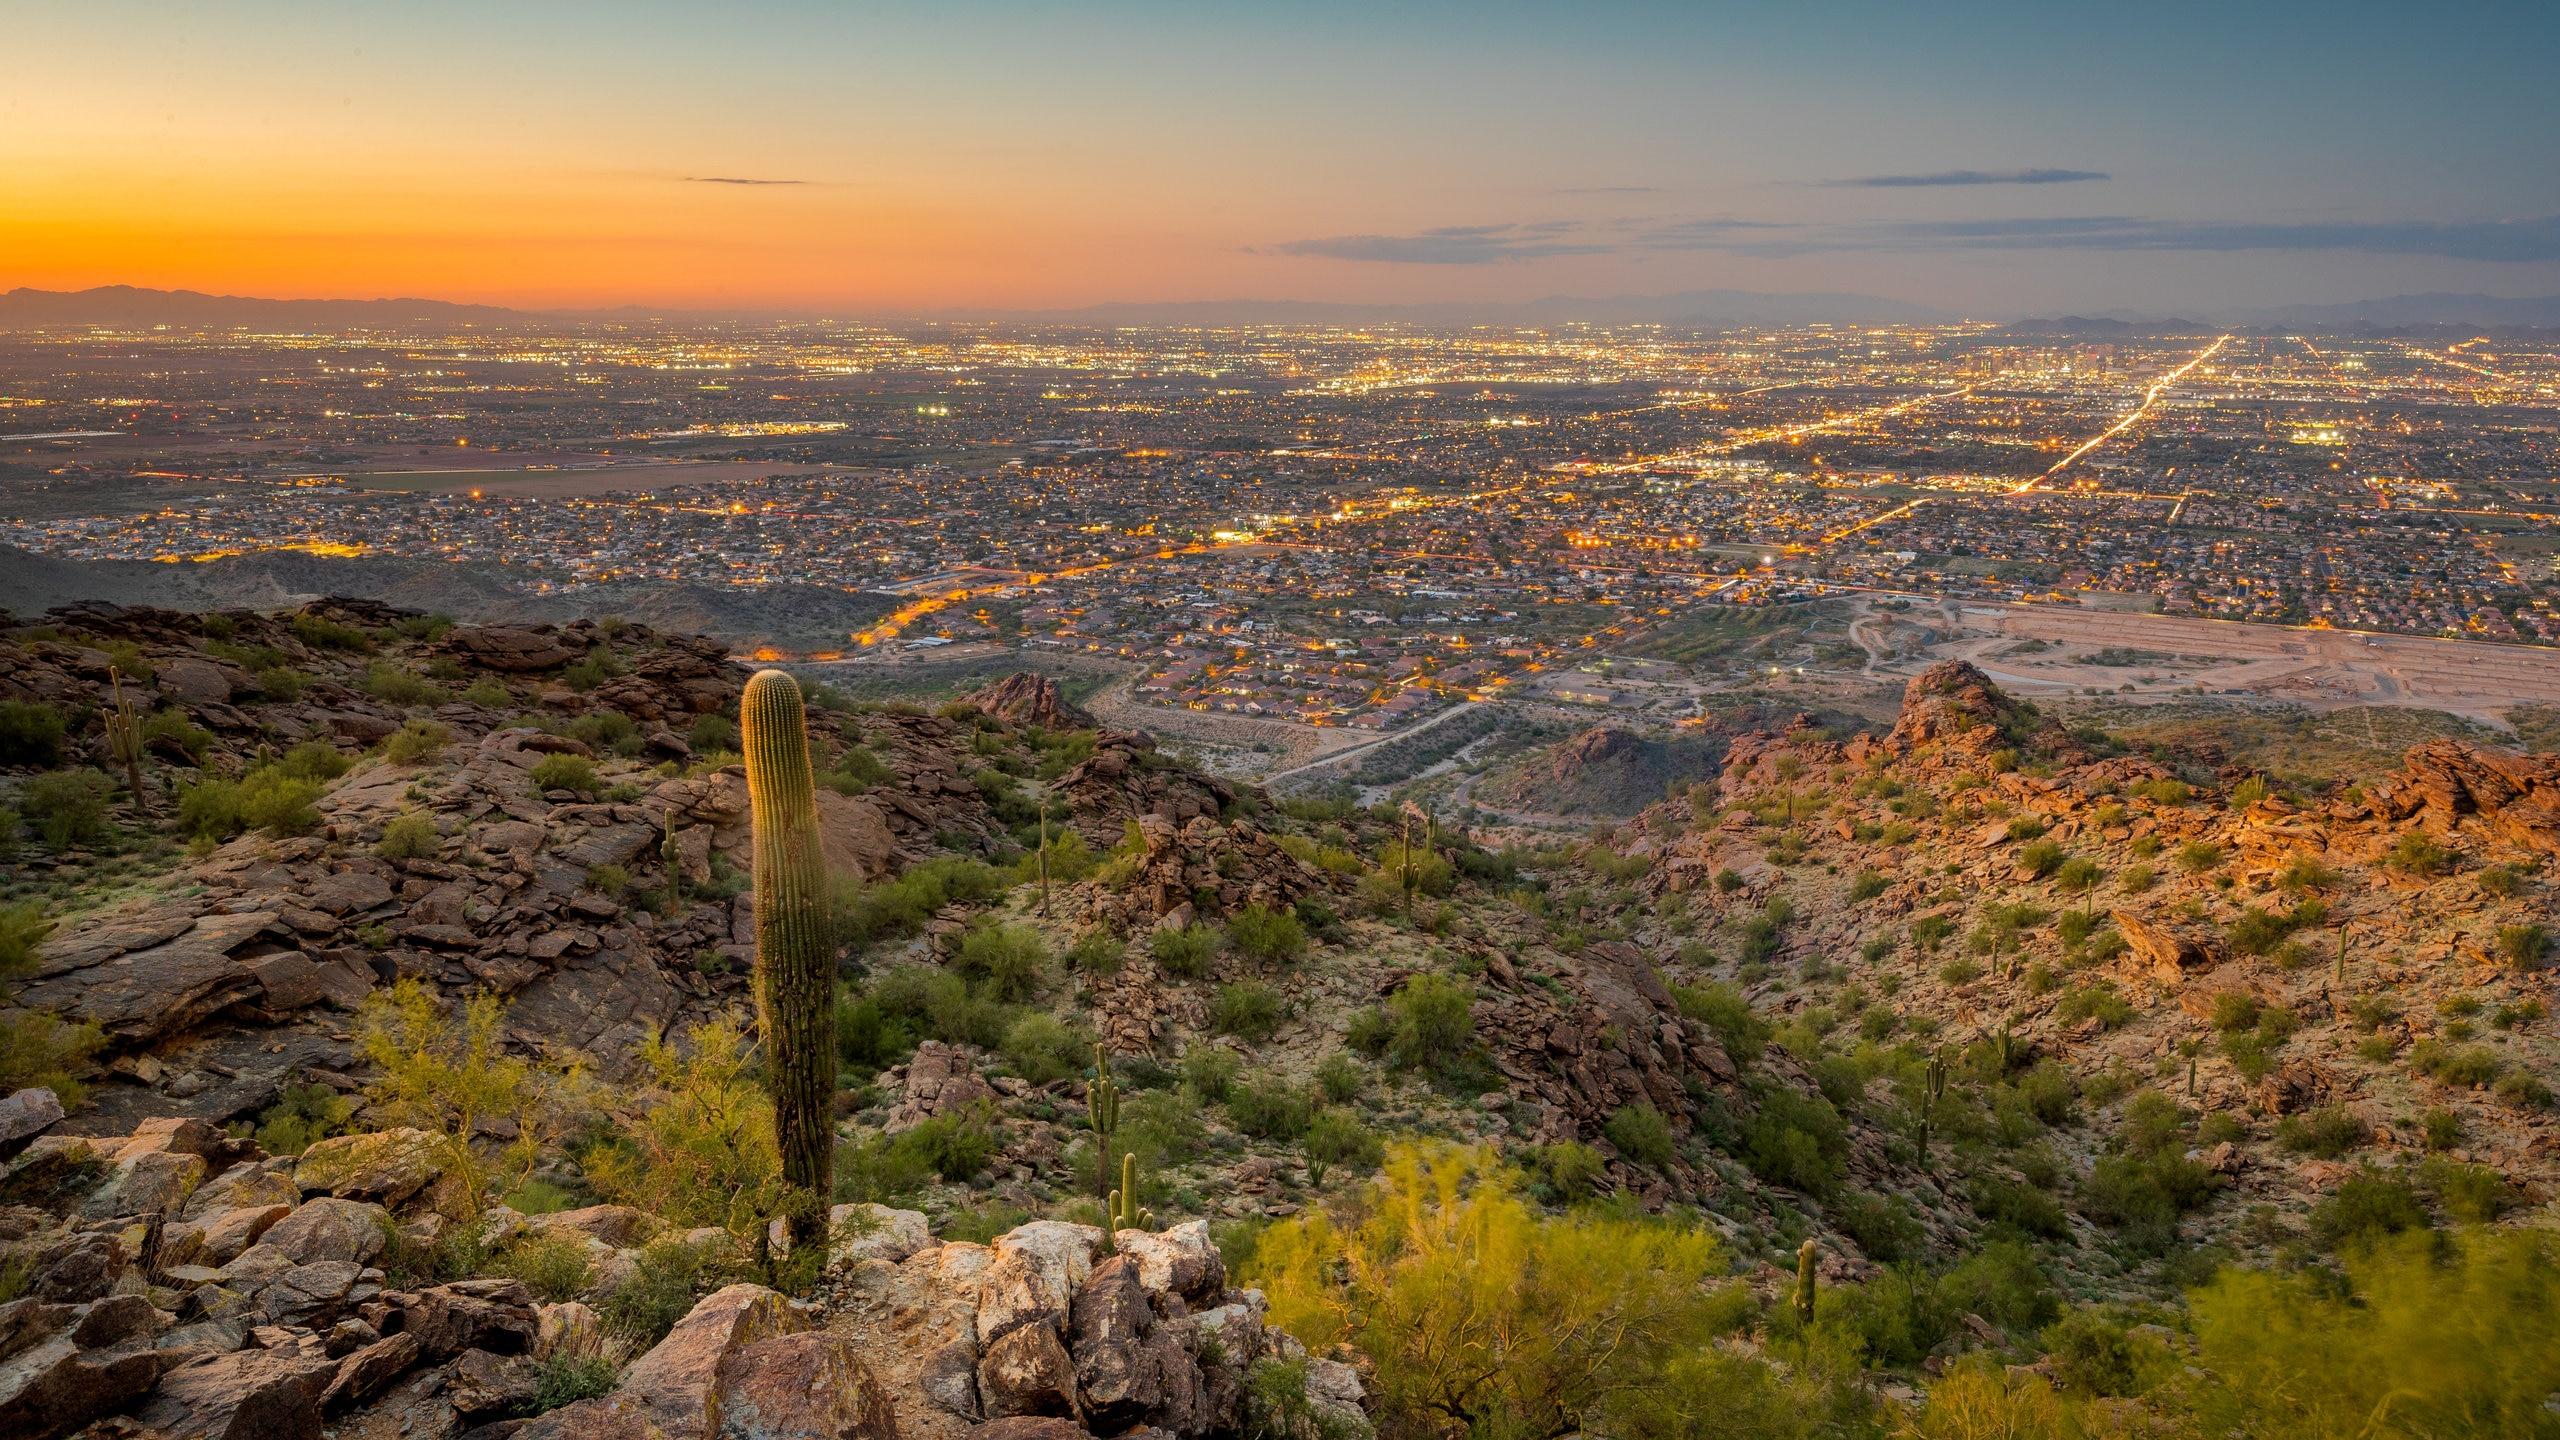 South Mountain, Phoenix, Arizona, United States of America